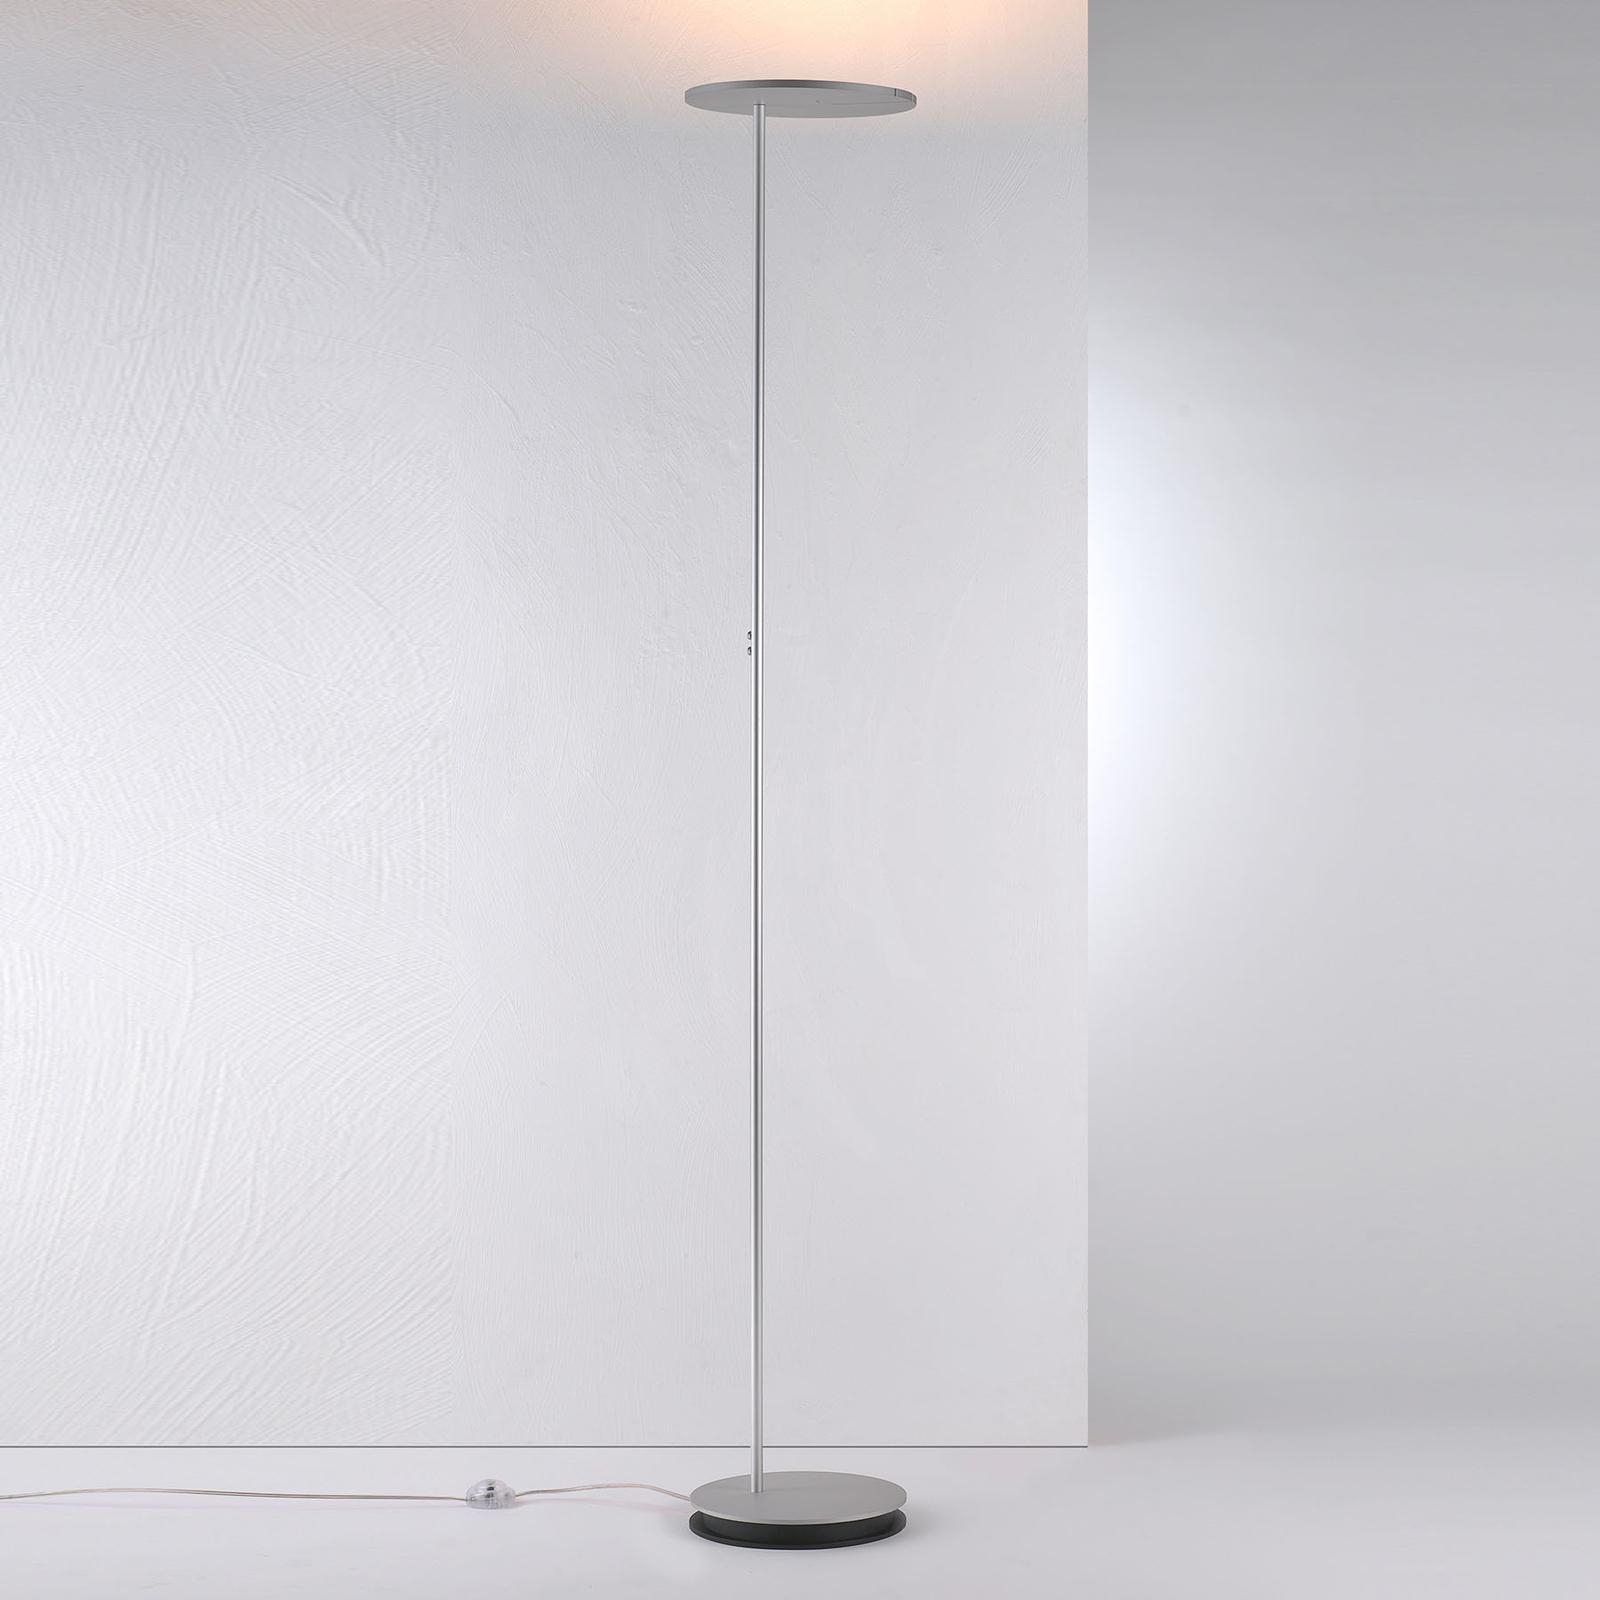 Bopp Share lampadaire indirect LED liseuse, alu